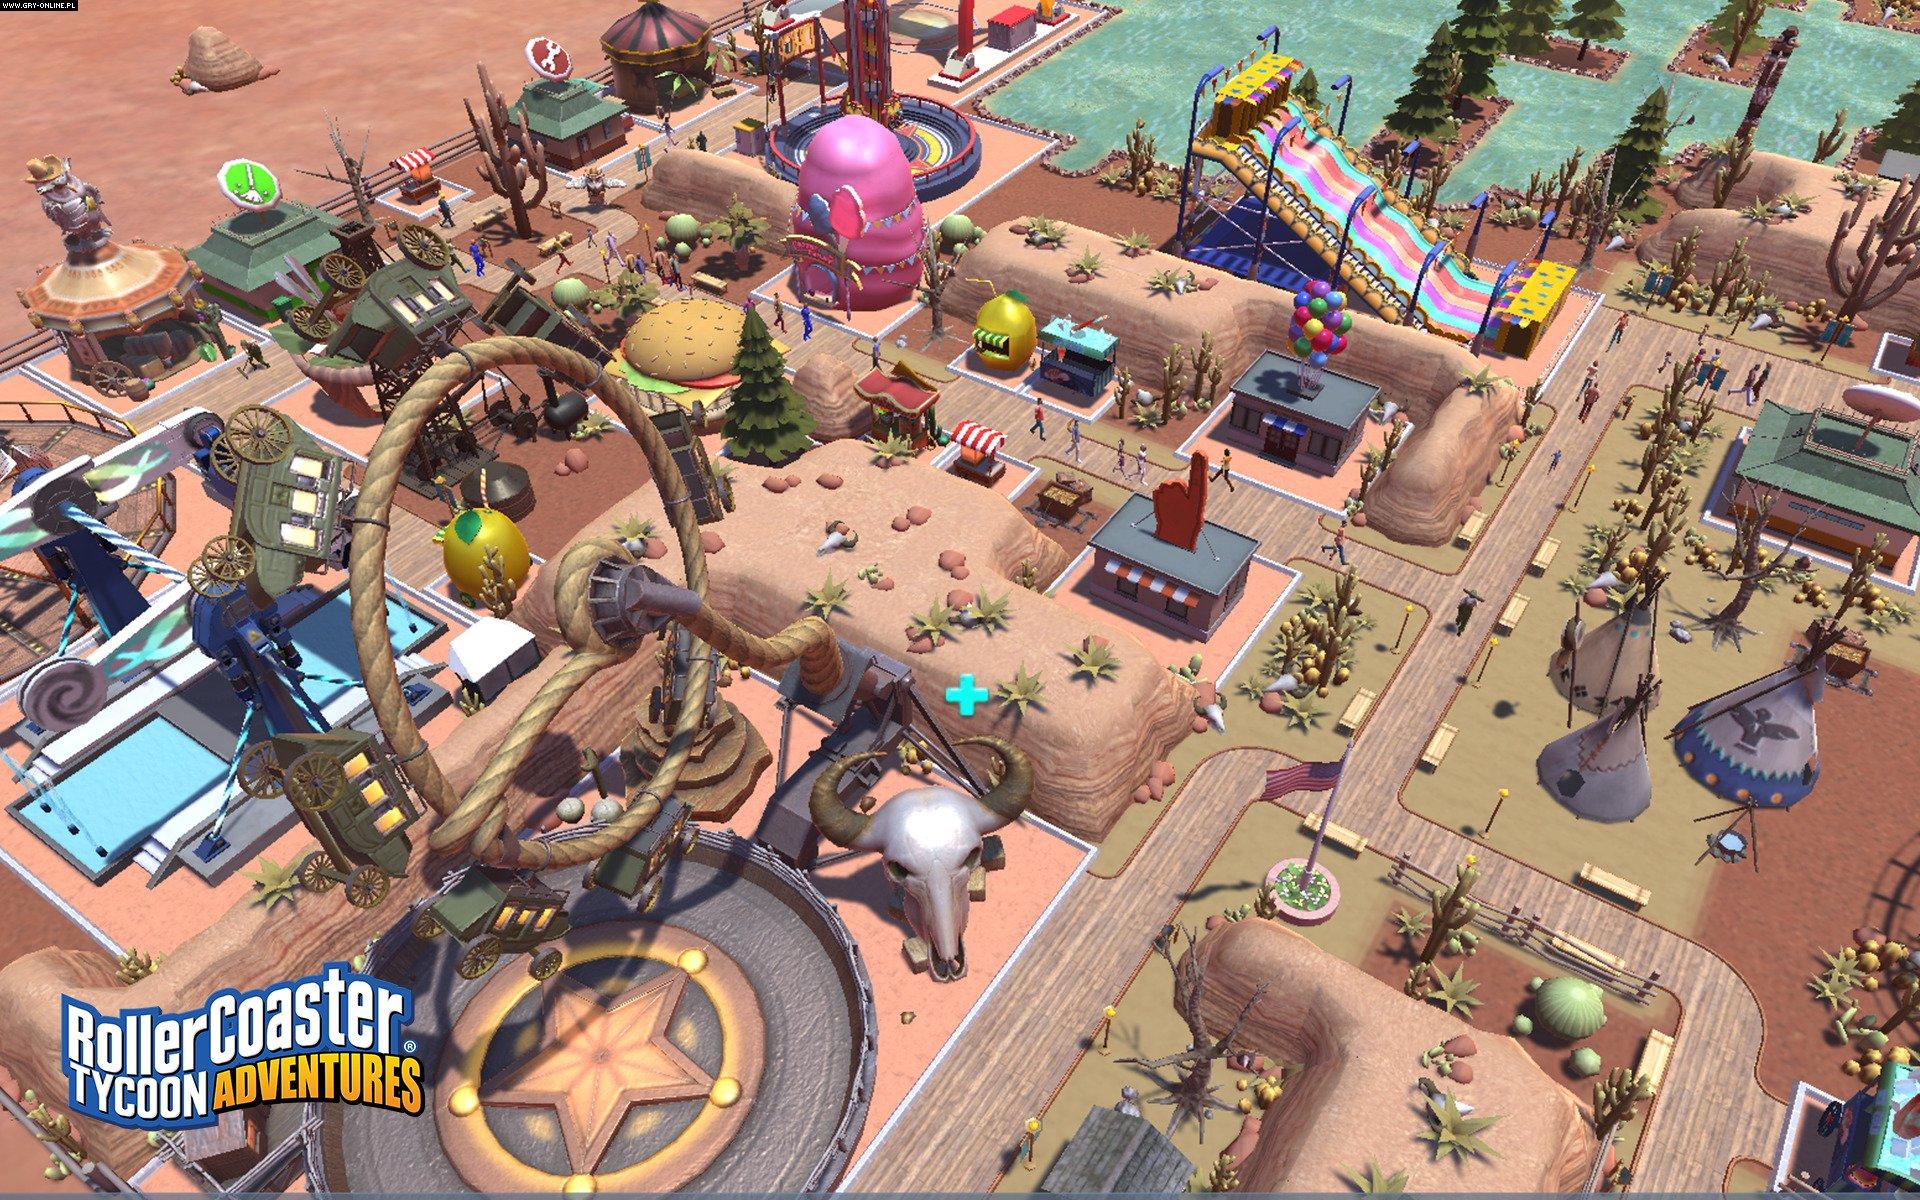 RollerCoaster Tycoon Adventures - screenshots gallery